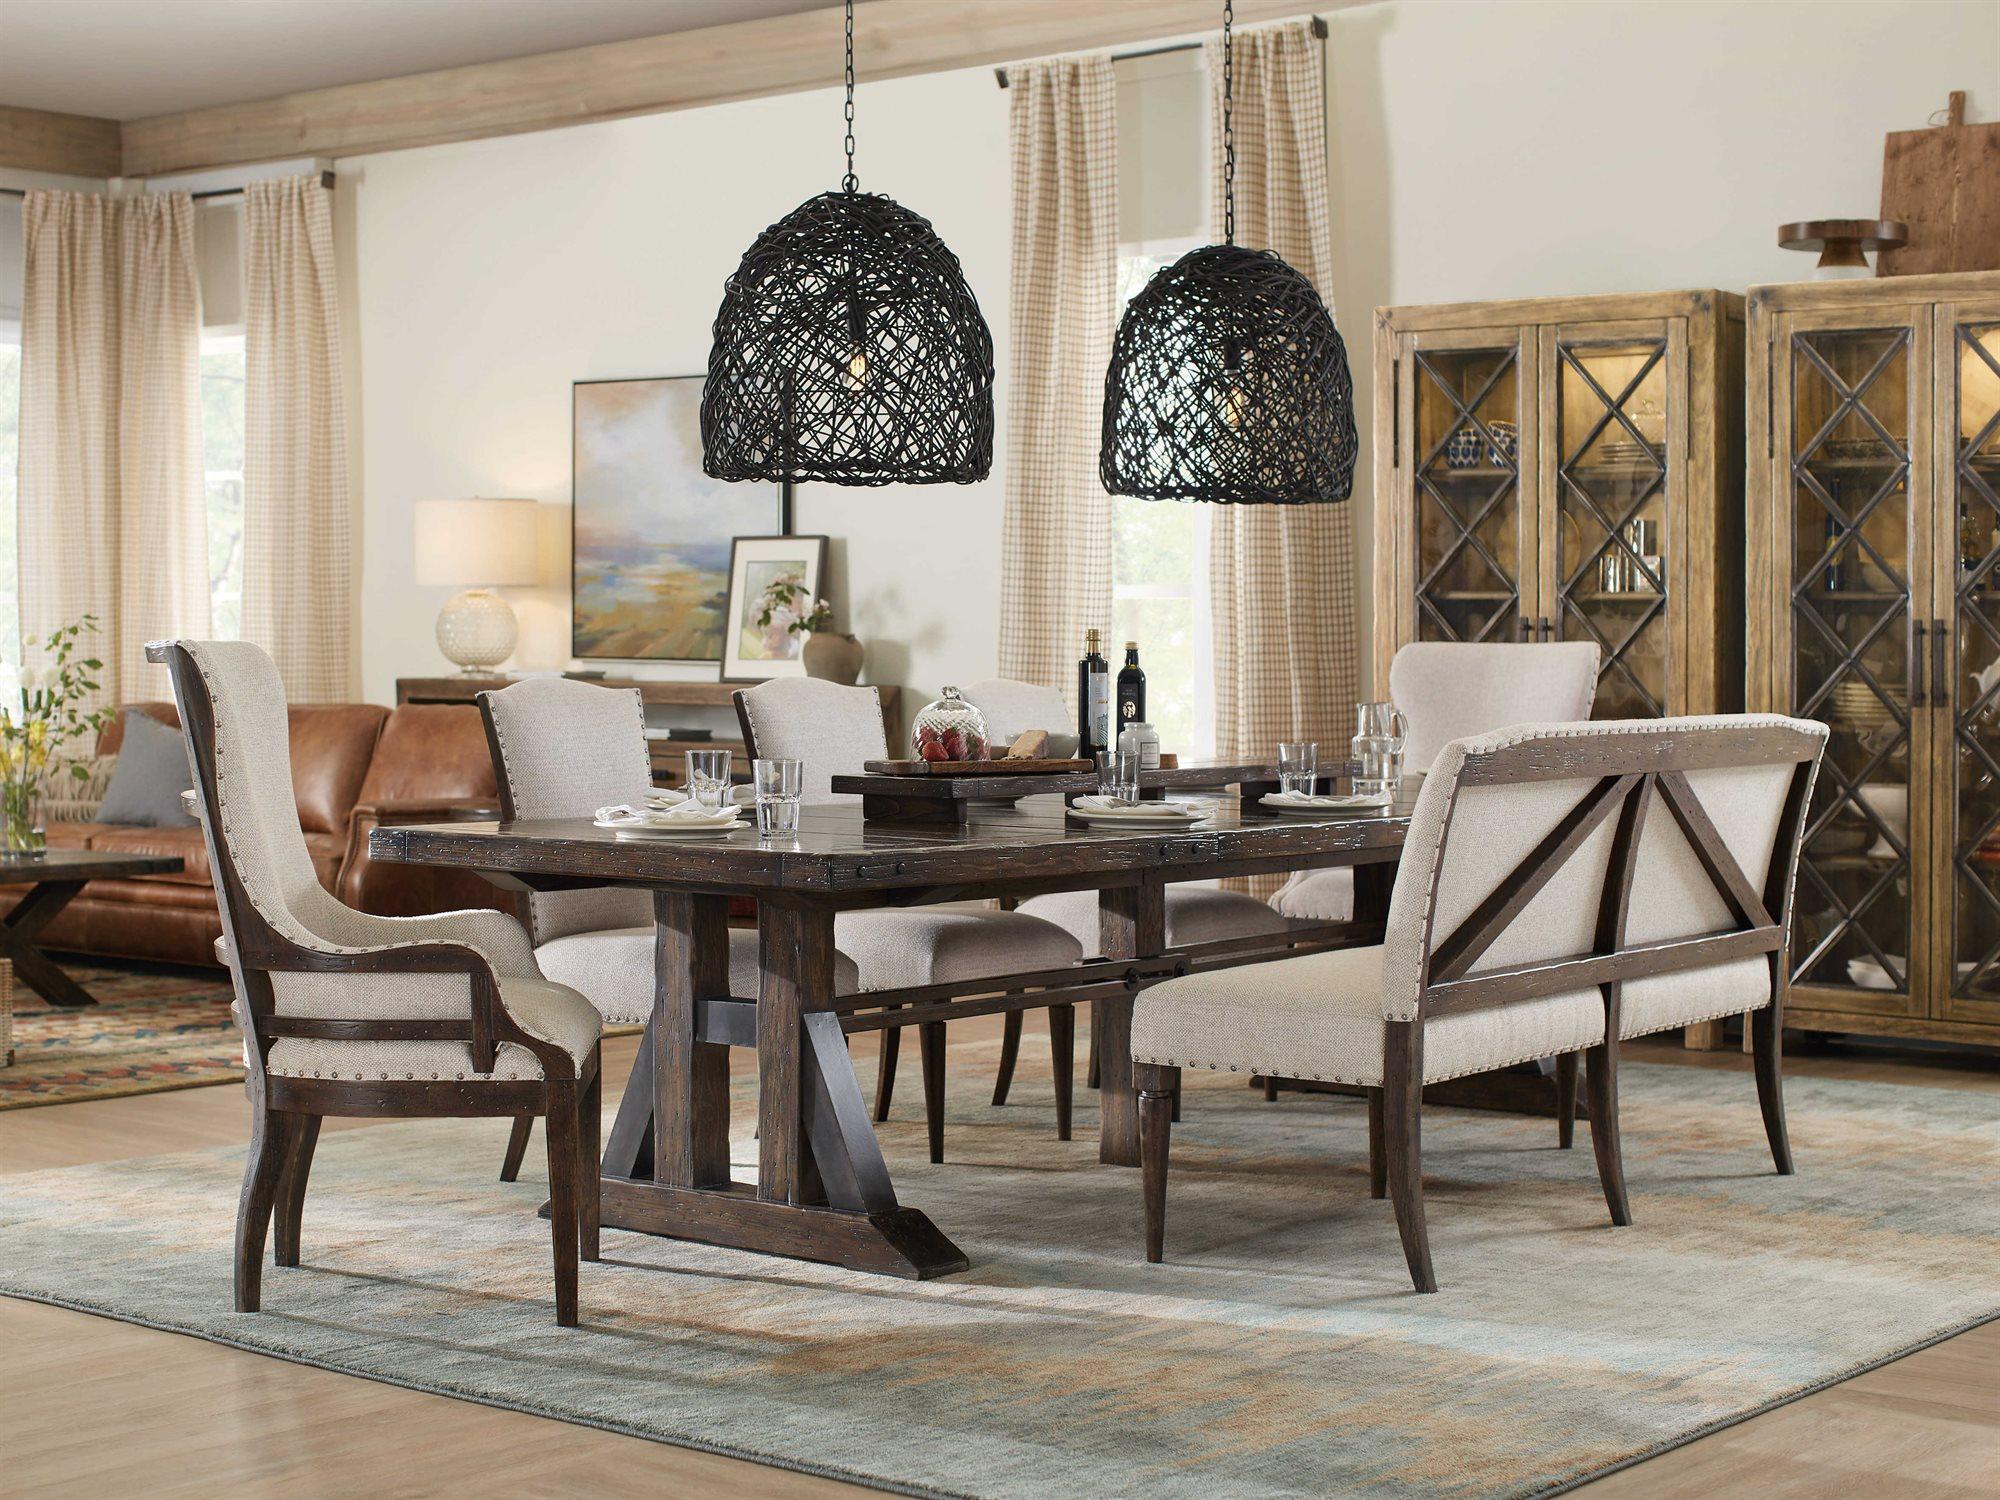 Hooker Furniture American Life Roslyn County Dining Room Set Hoo161875207dkwset